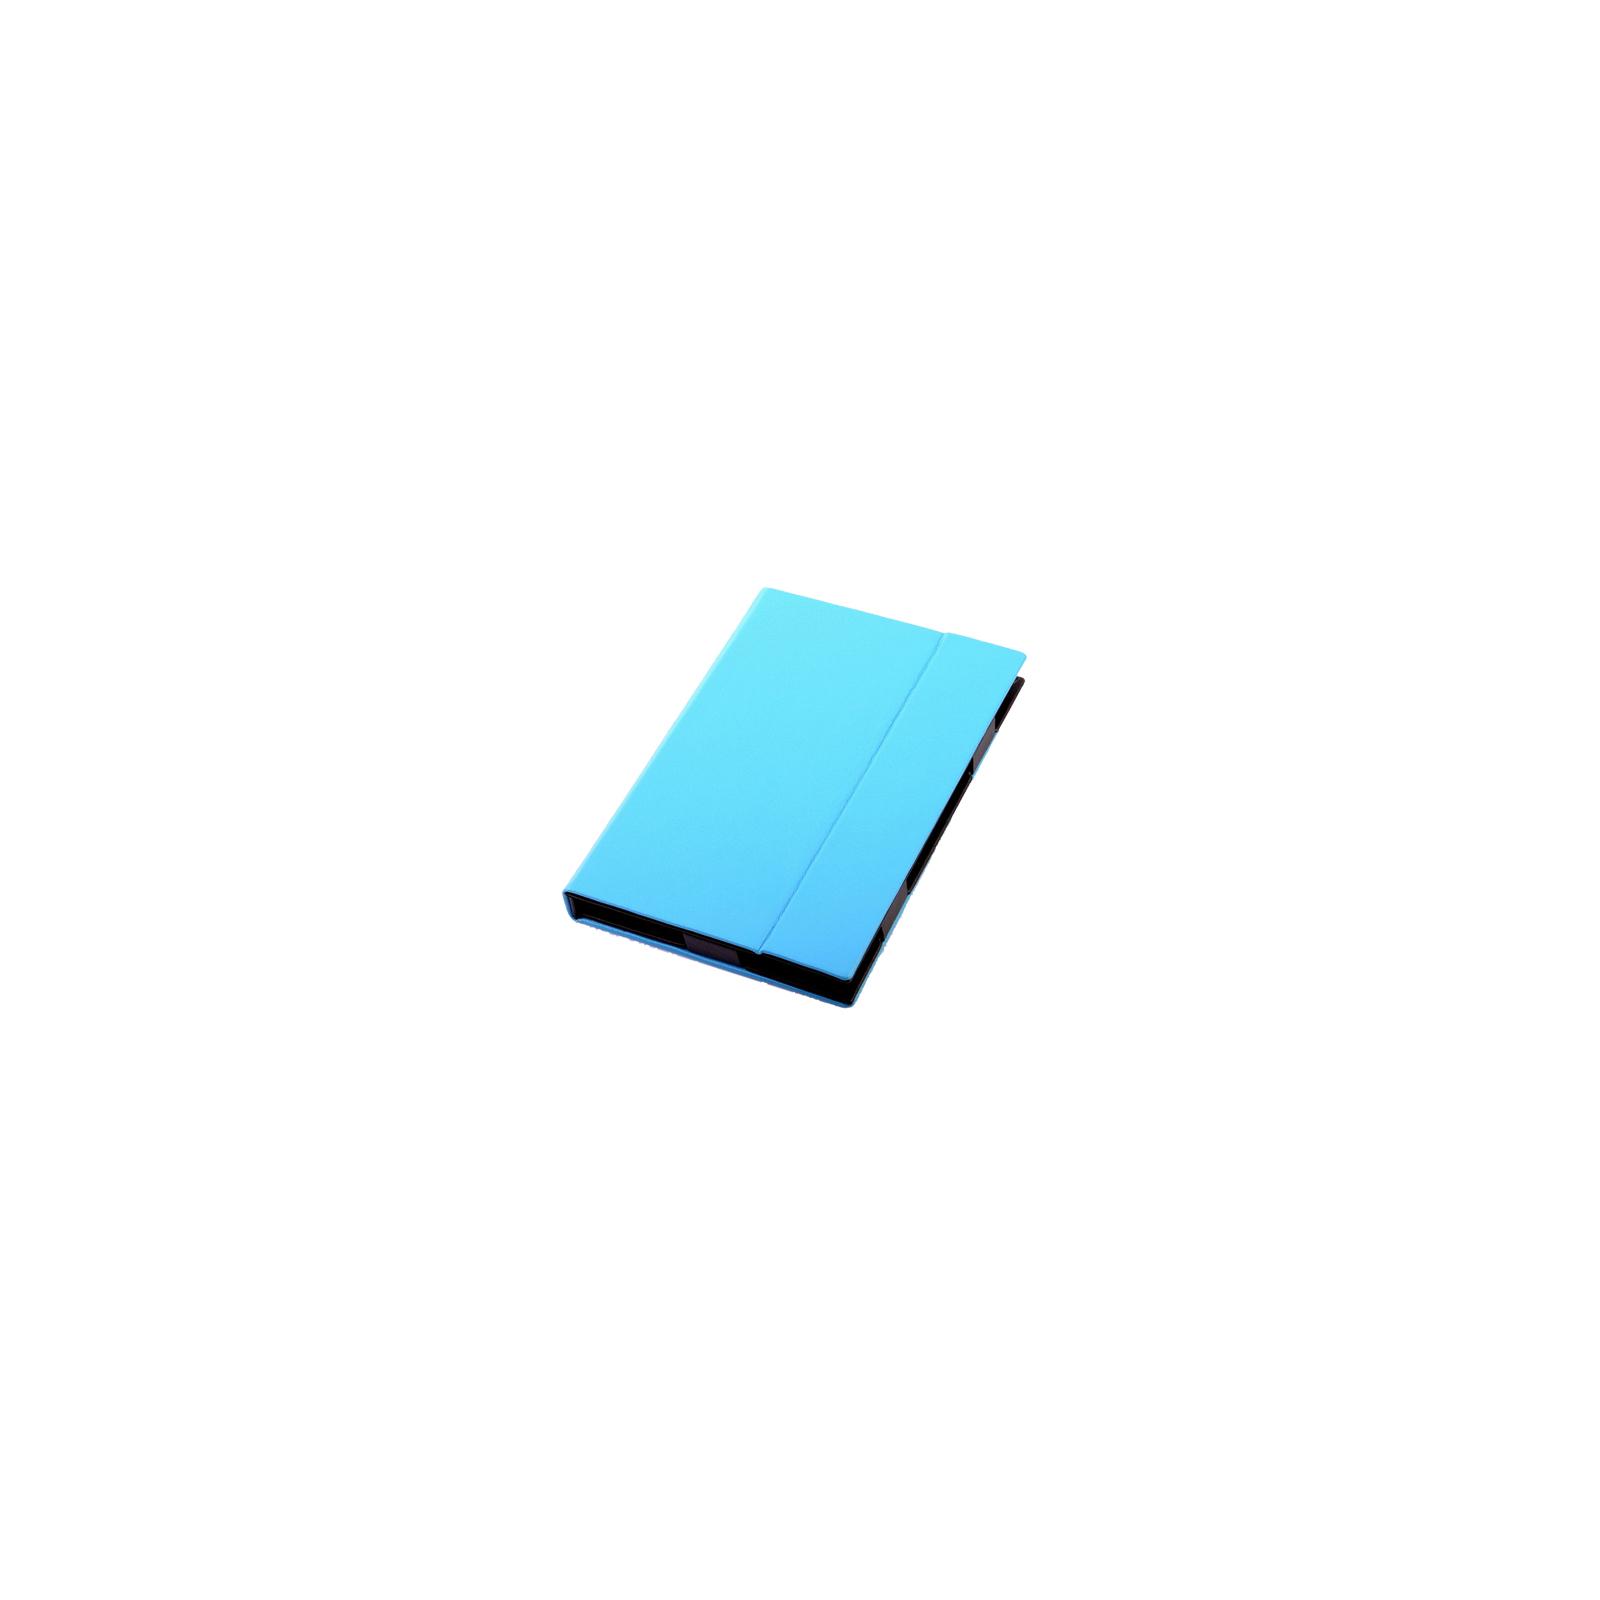 Чехол для планшета Vento 9 Desire Bright -blue